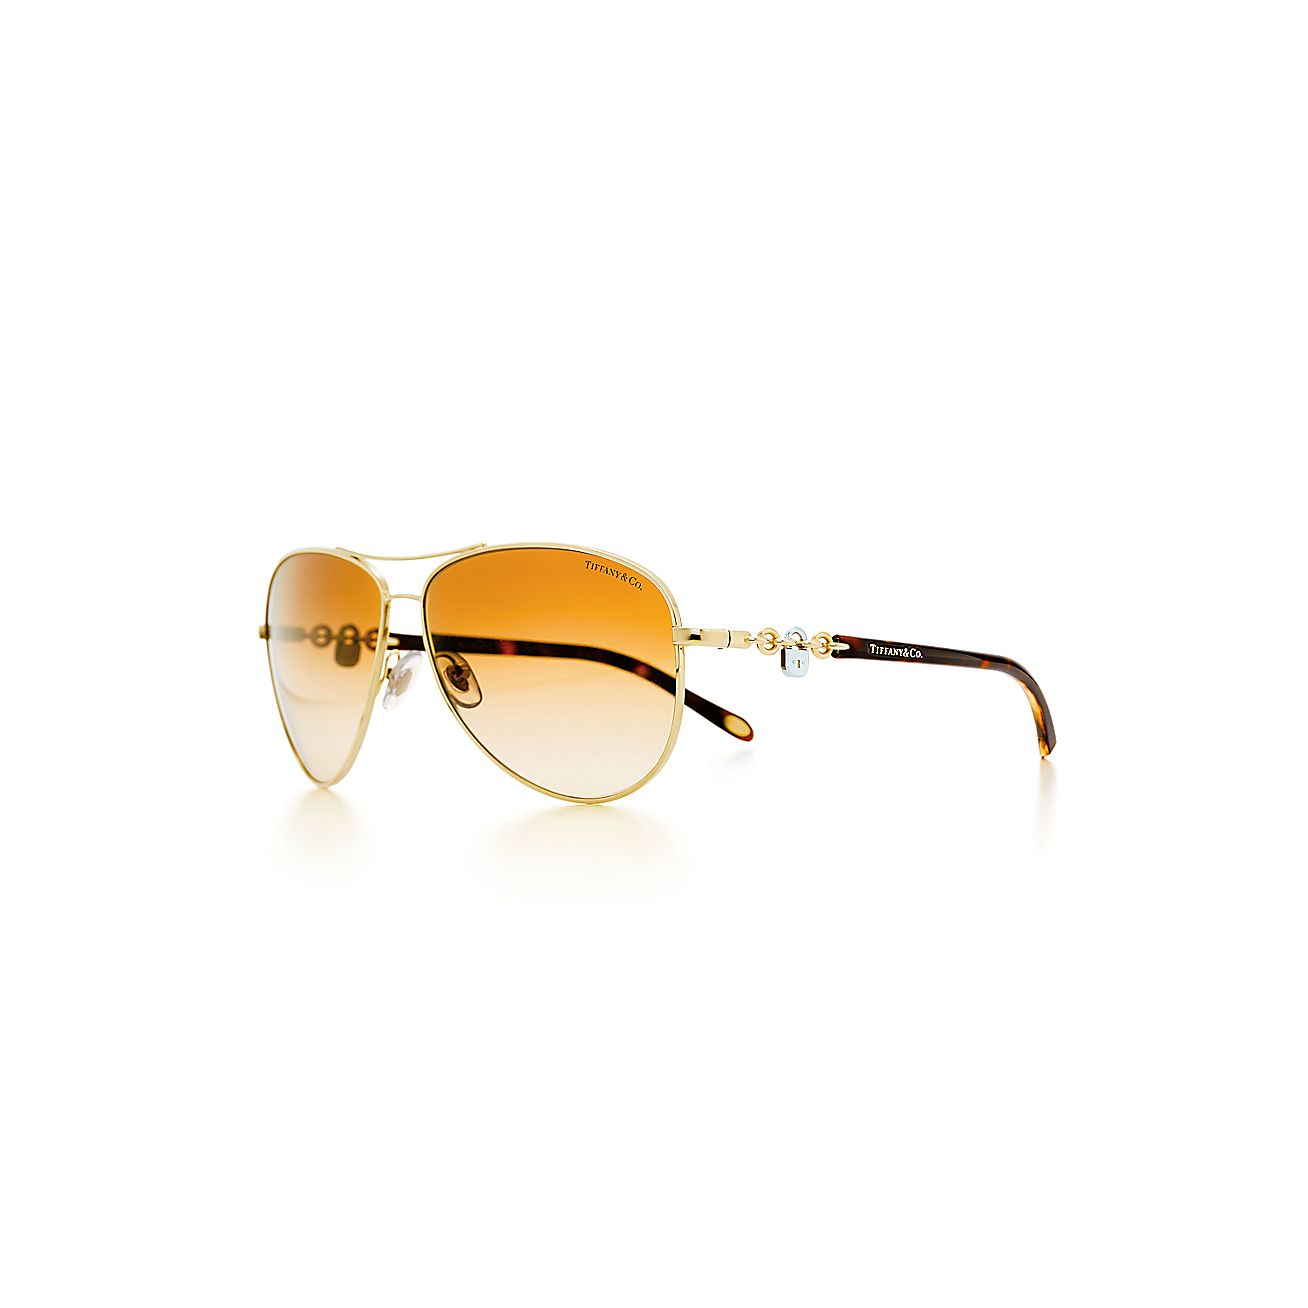 97c2cc095255 Tiffany Blue Aviator Sunglasses